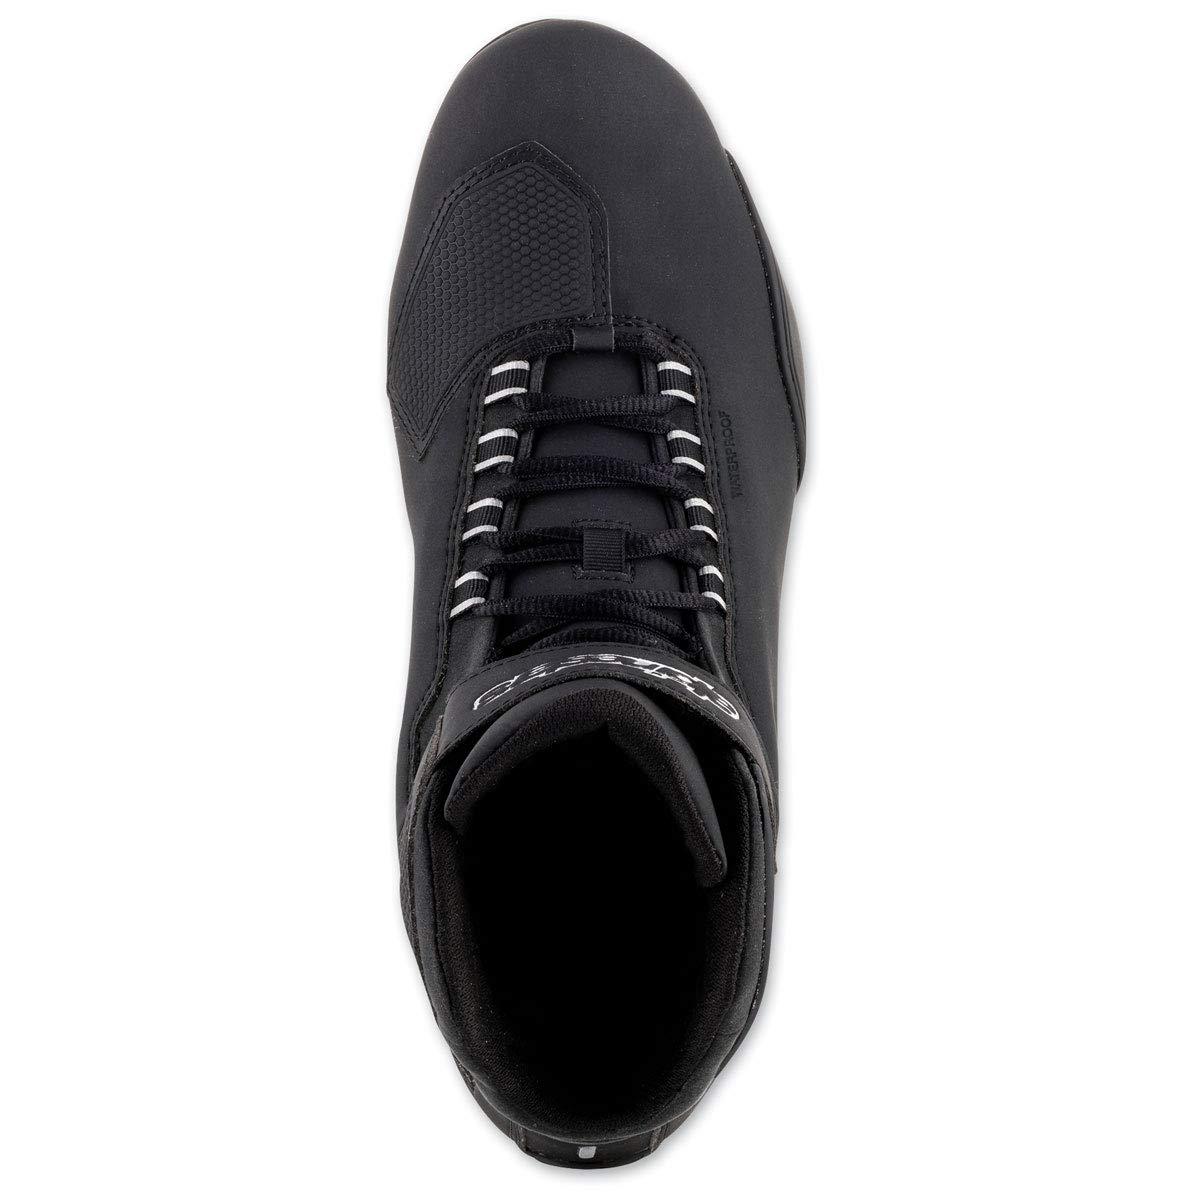 Motorcycle boots Sektor Waterproof Shoe Black Alpinestars